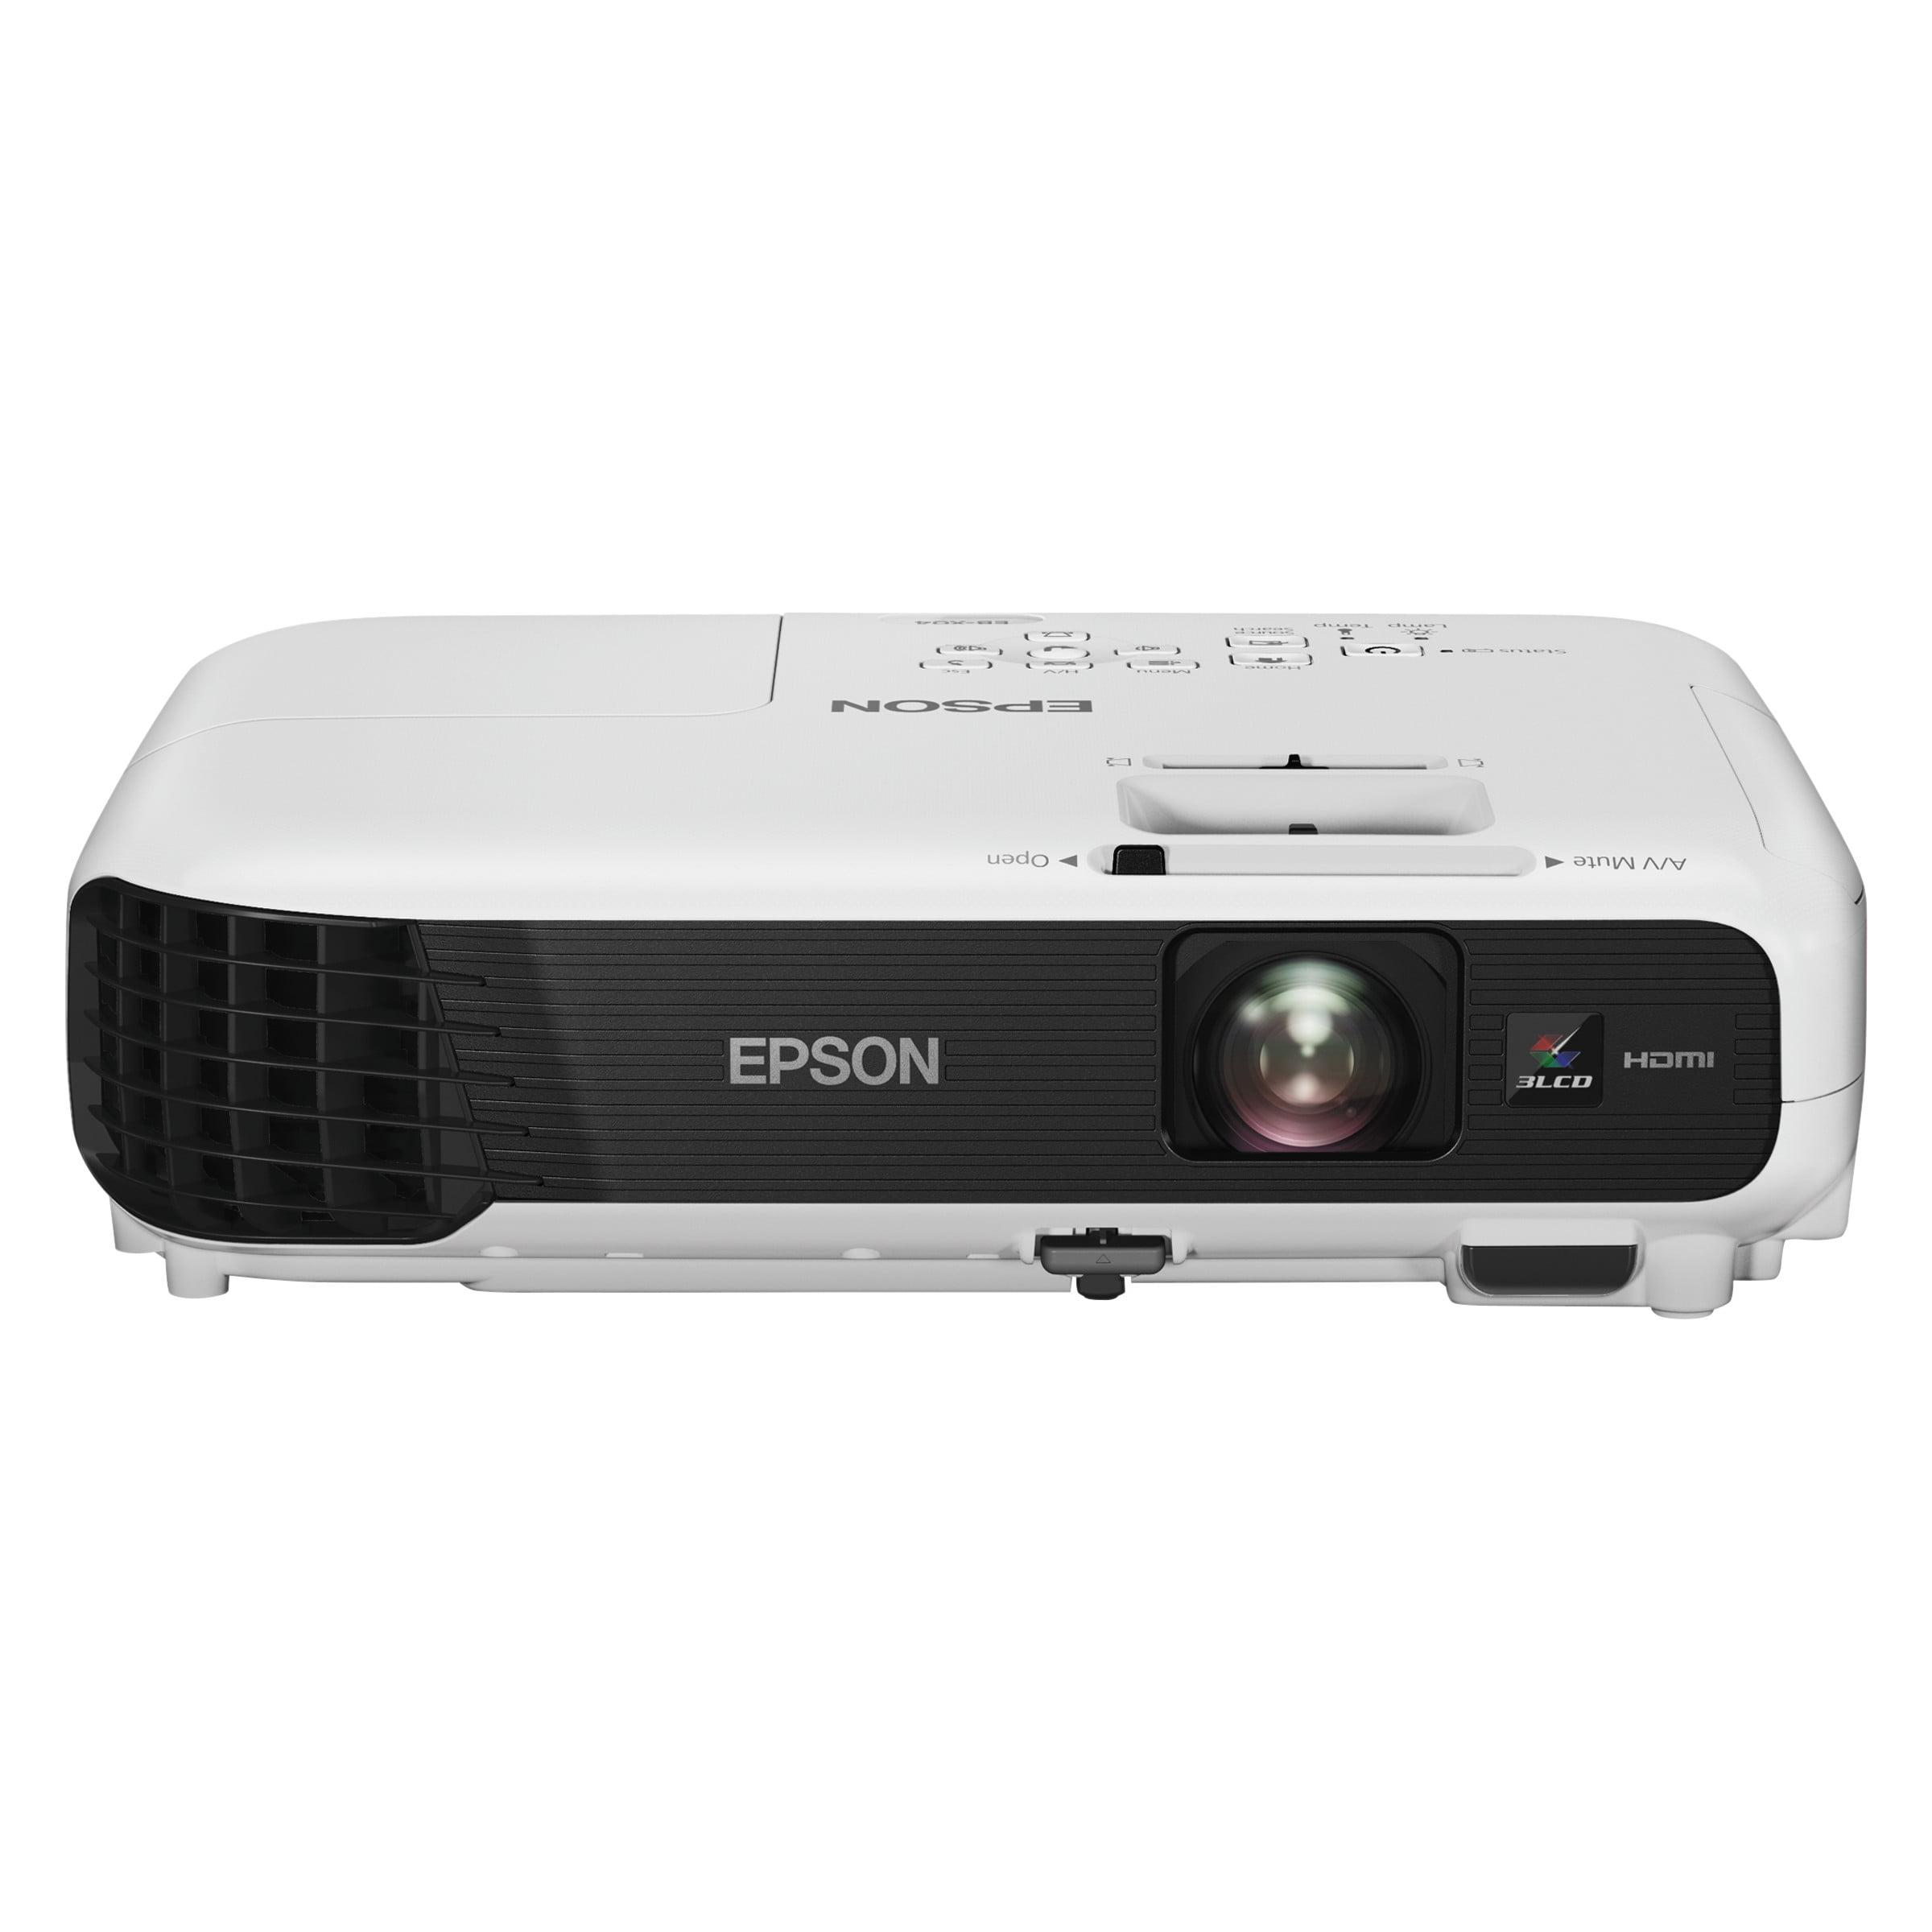 Epson VS340 XGA 3LCD Projector, 2800 Lumens, 1024 x 768 Pixels, 1.2x Zoom